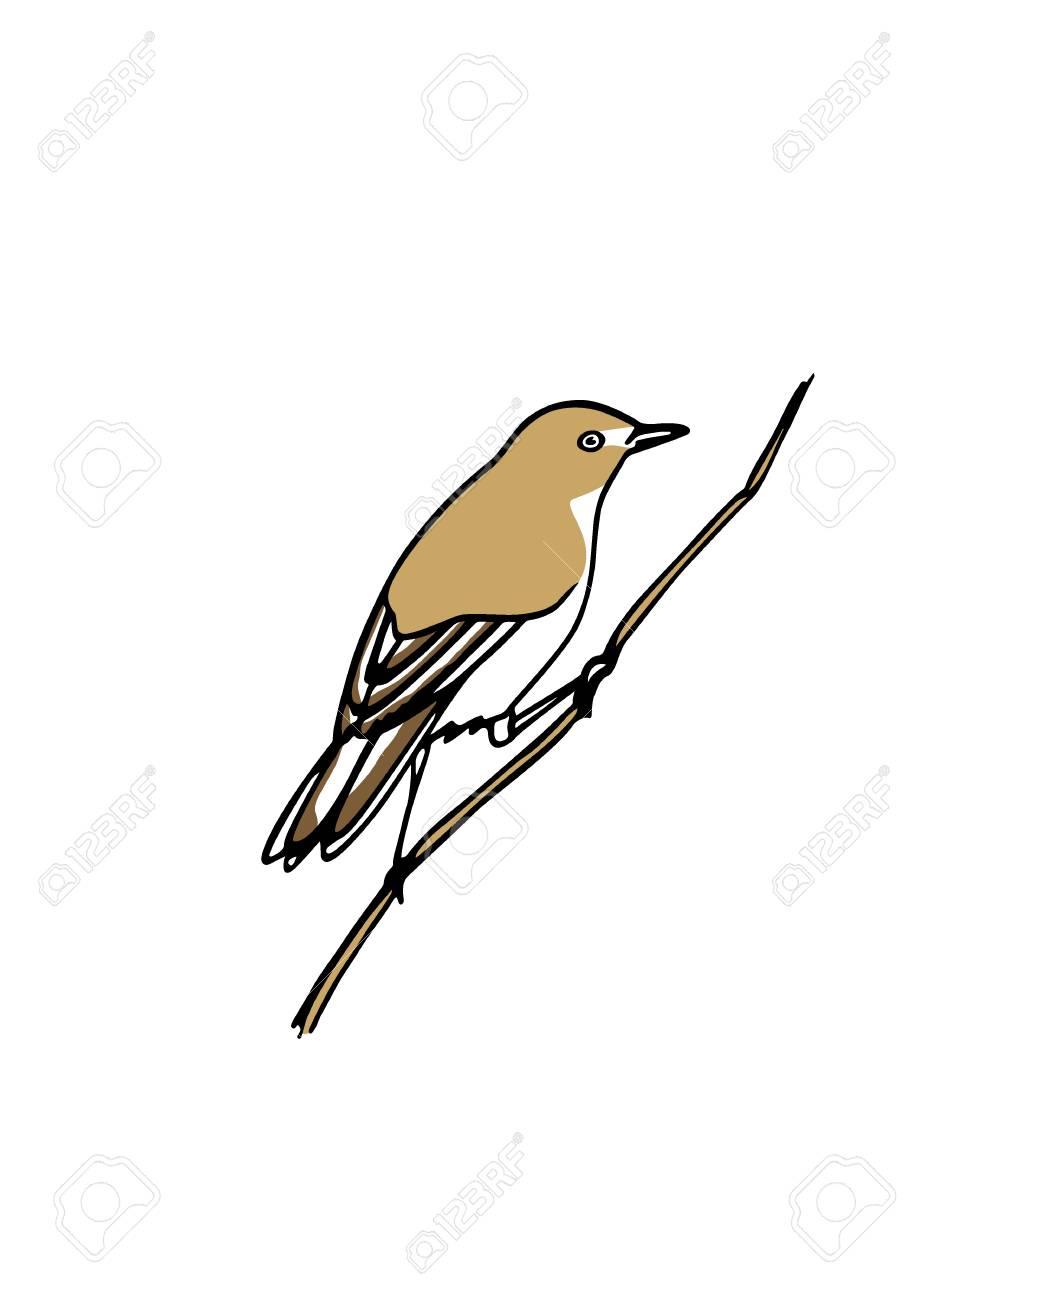 Hand drawn bird - 69147377